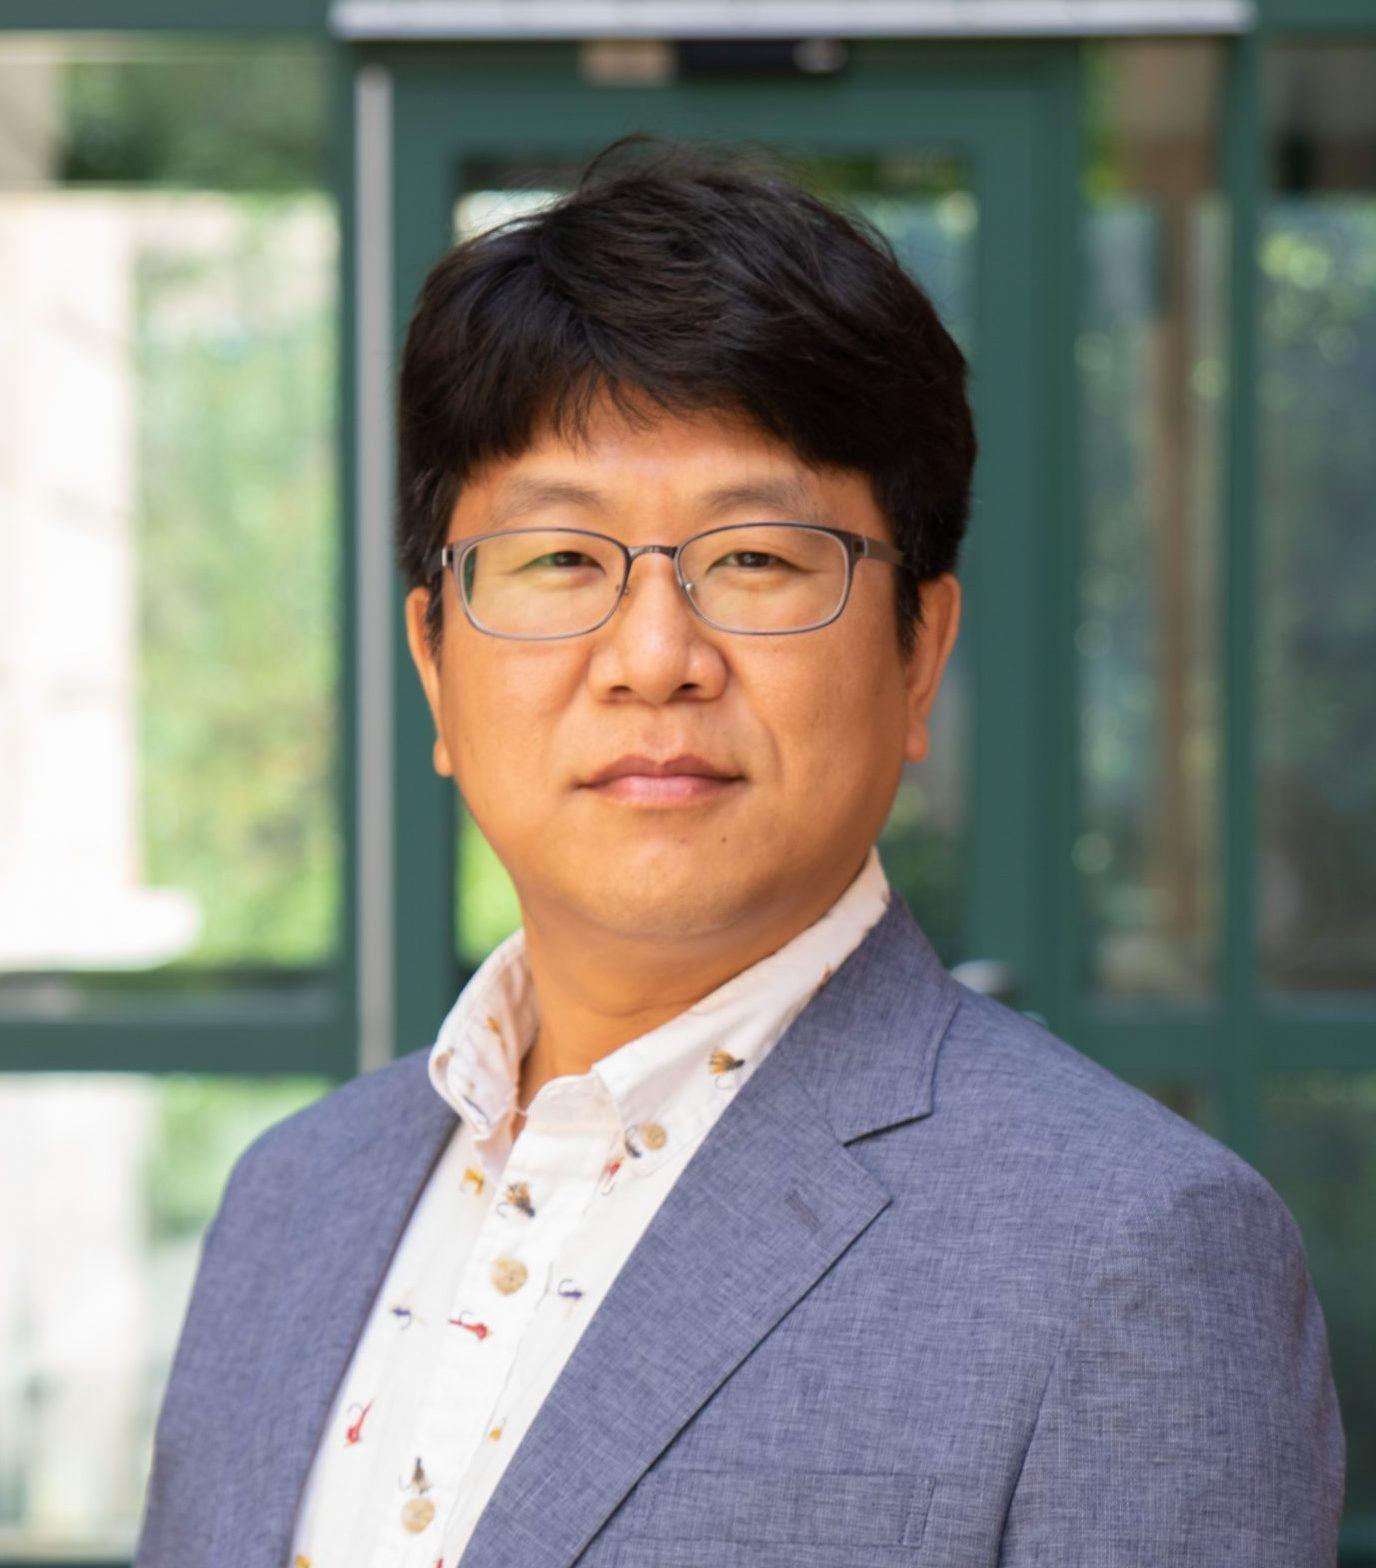 Dae Seok Eom